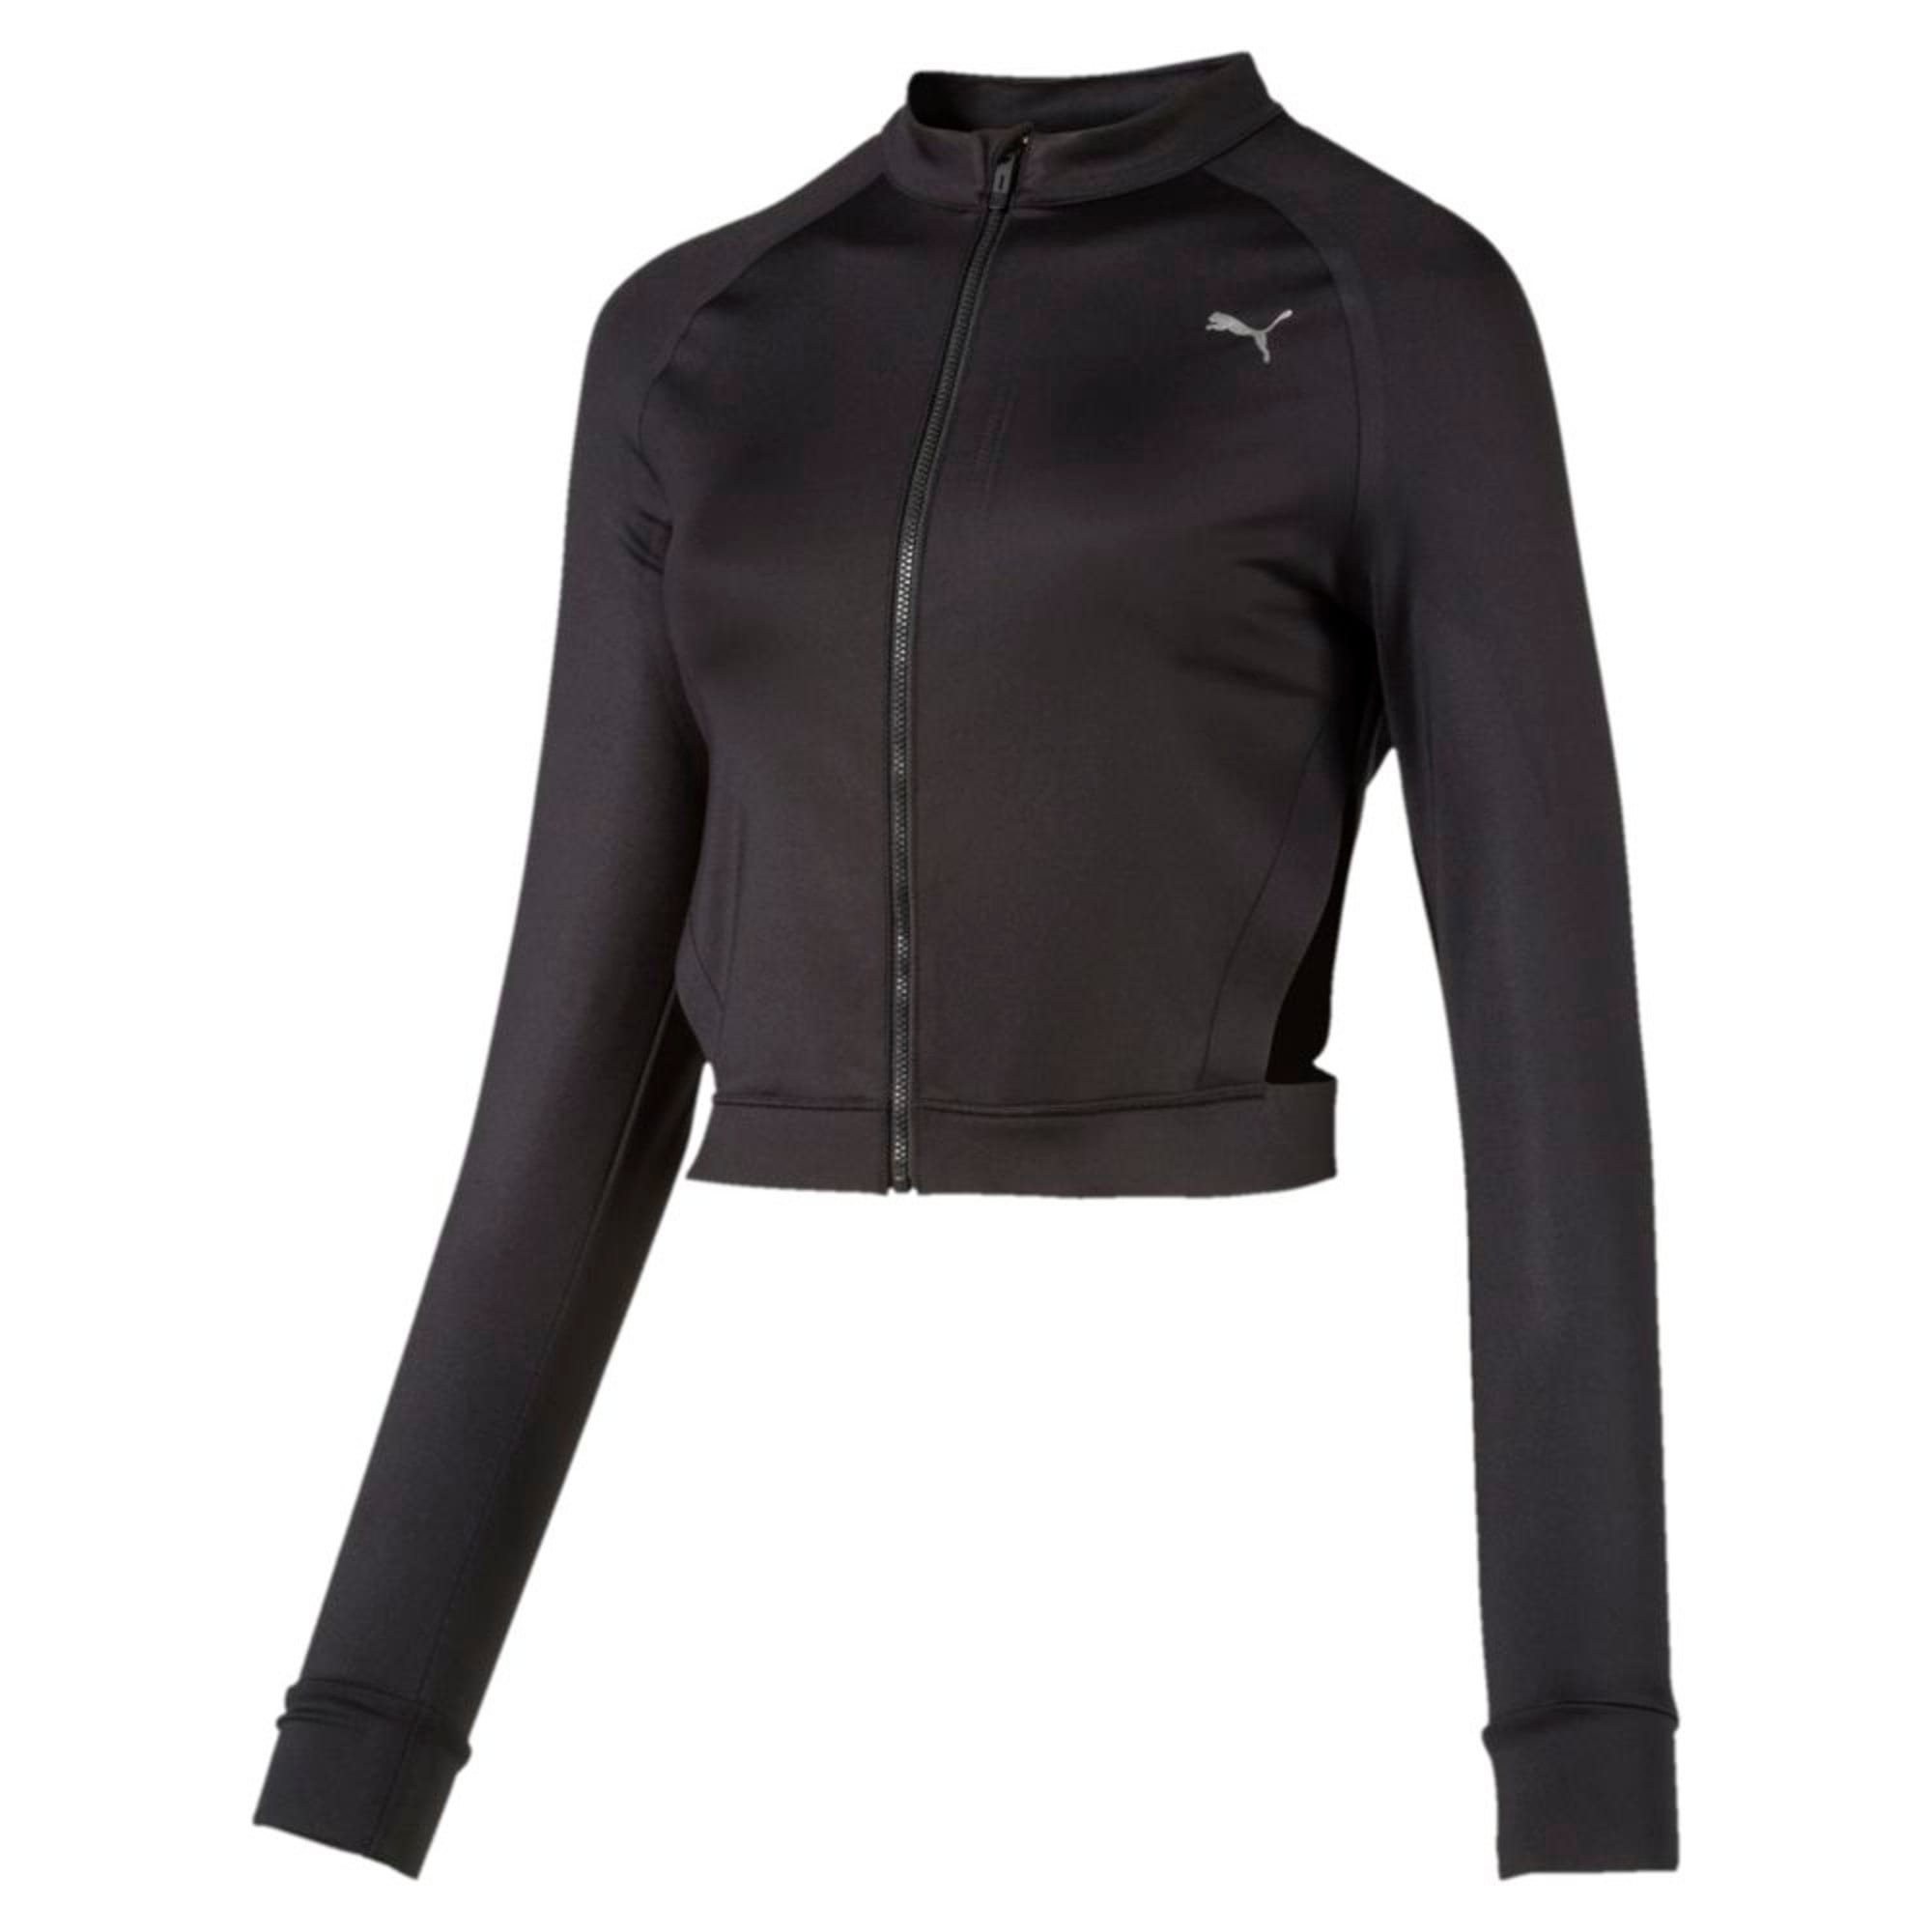 Thumbnail 5 of Explosive Cut-Out Women's Jacket, Puma Black, medium-IND